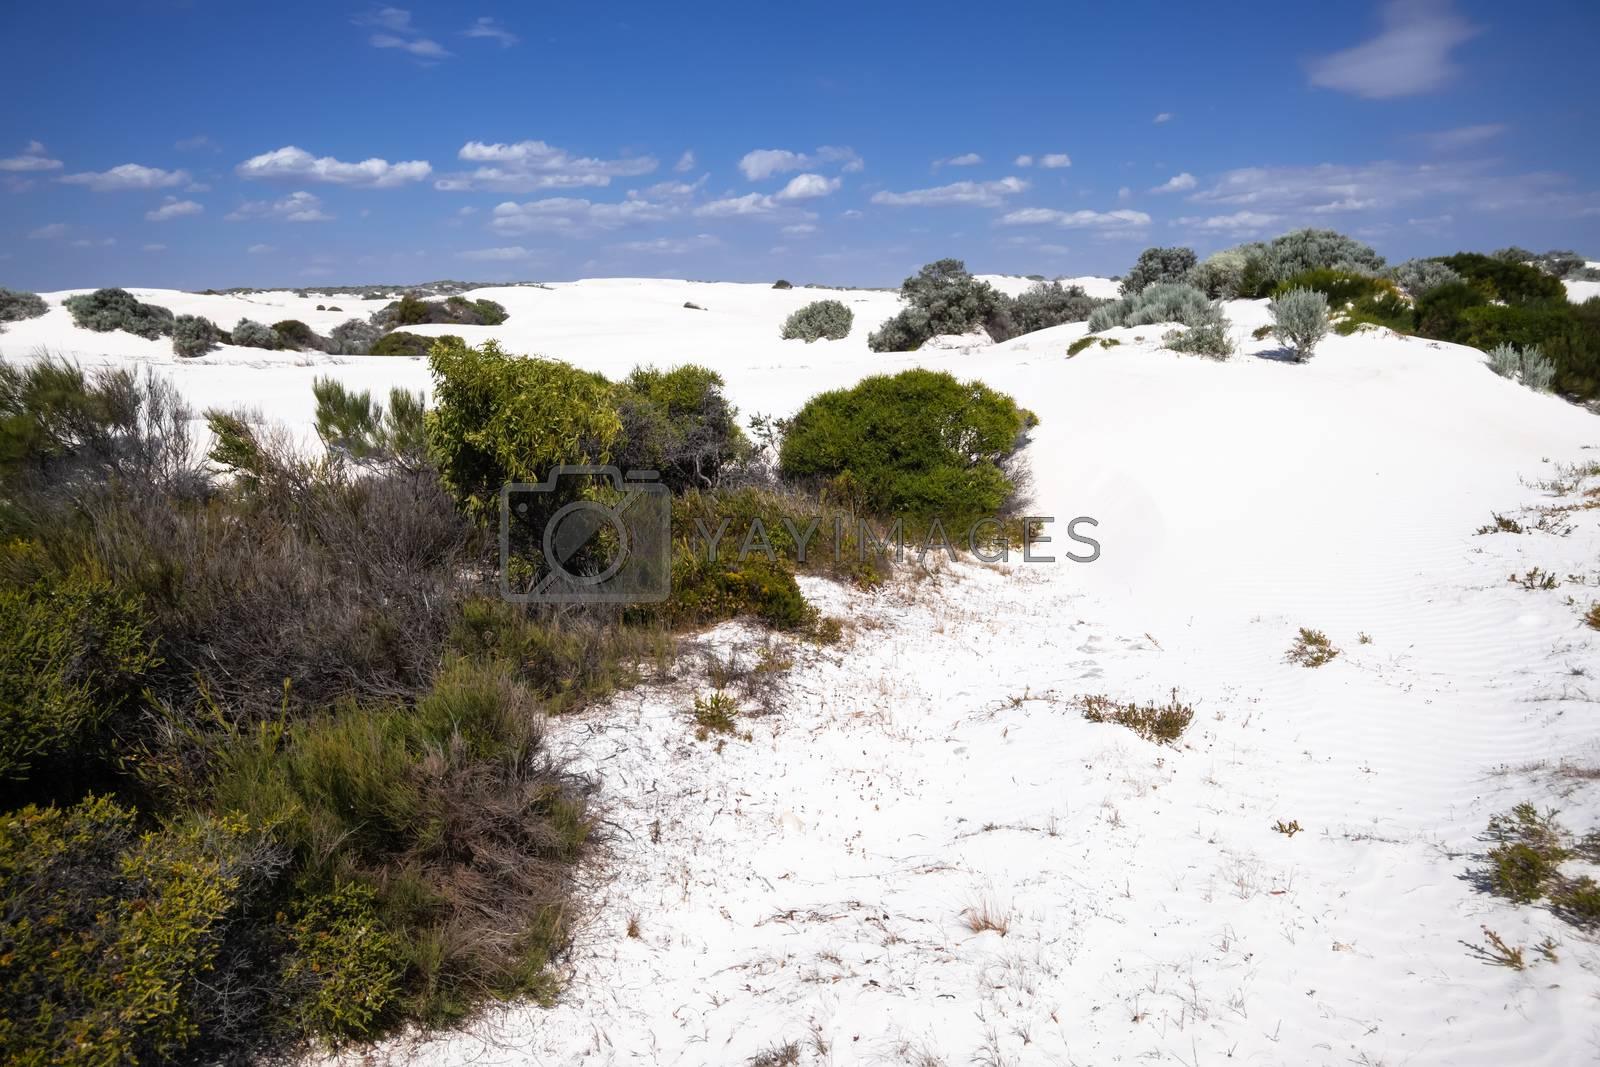 An image of white dune sand scenery western Australia